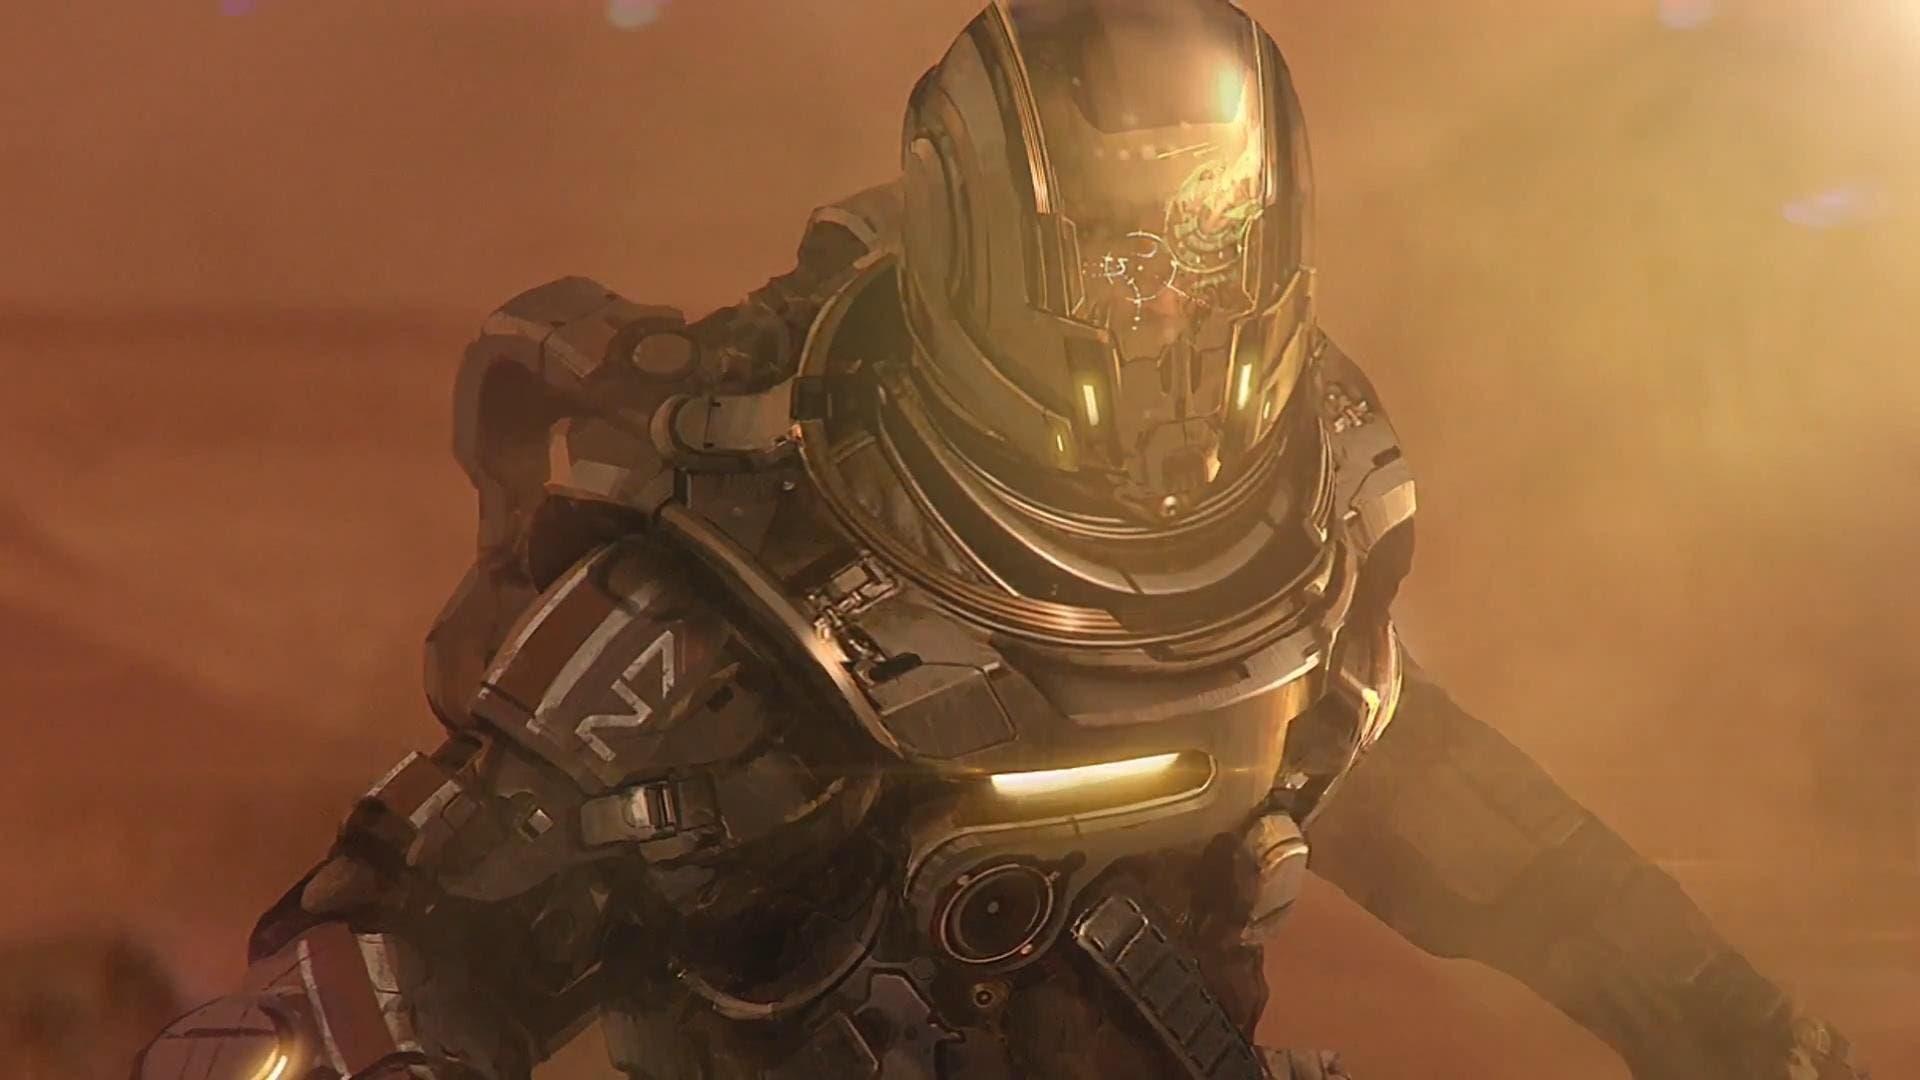 Imagen de Se descubre un posible nombre del protagonista de Mass Effect Andrómeda